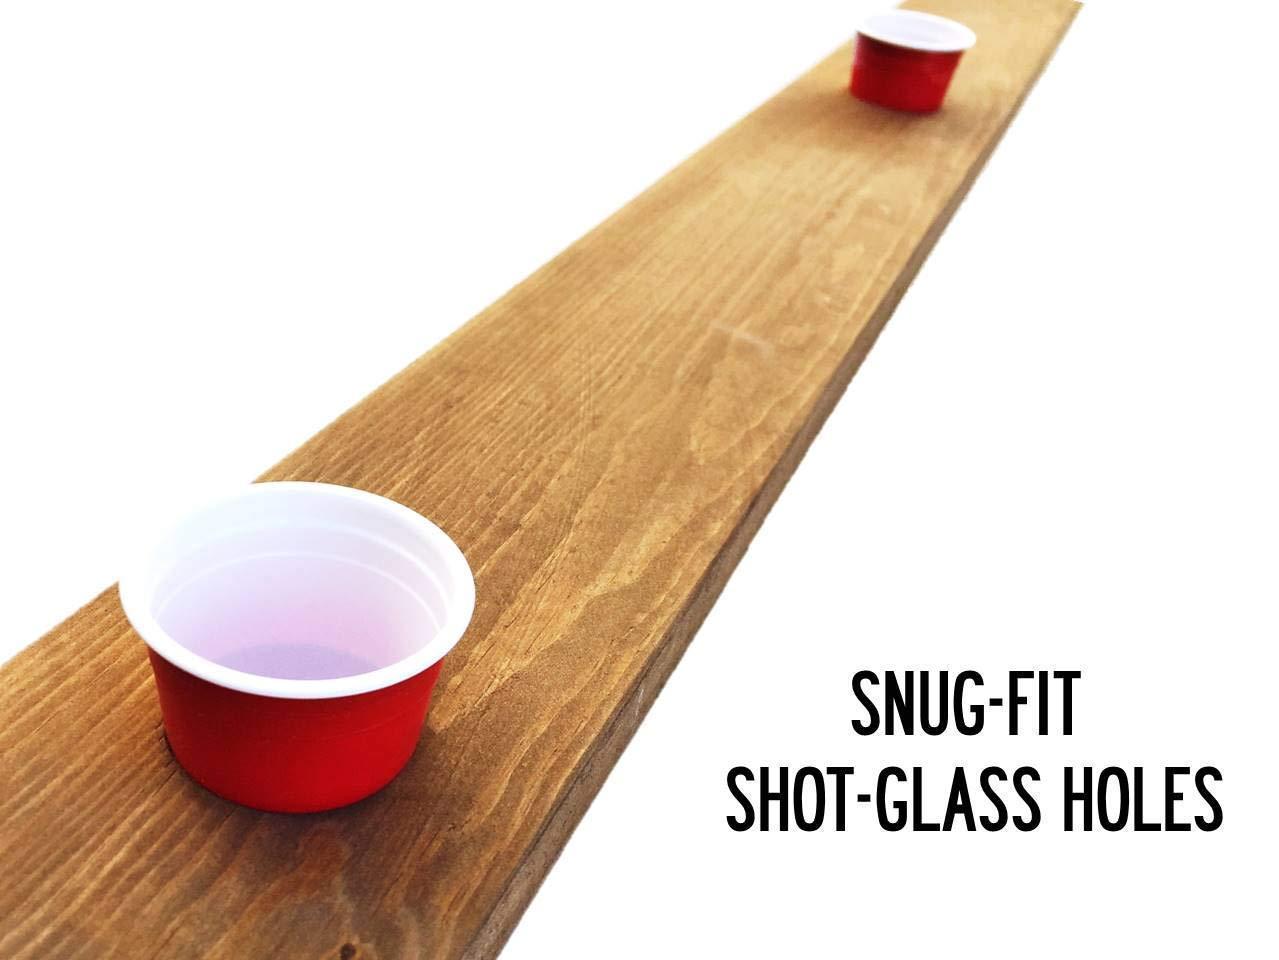 4 Person Shot Drinking Ski with Plastic Shot Glasses USA Drink/'n Ski